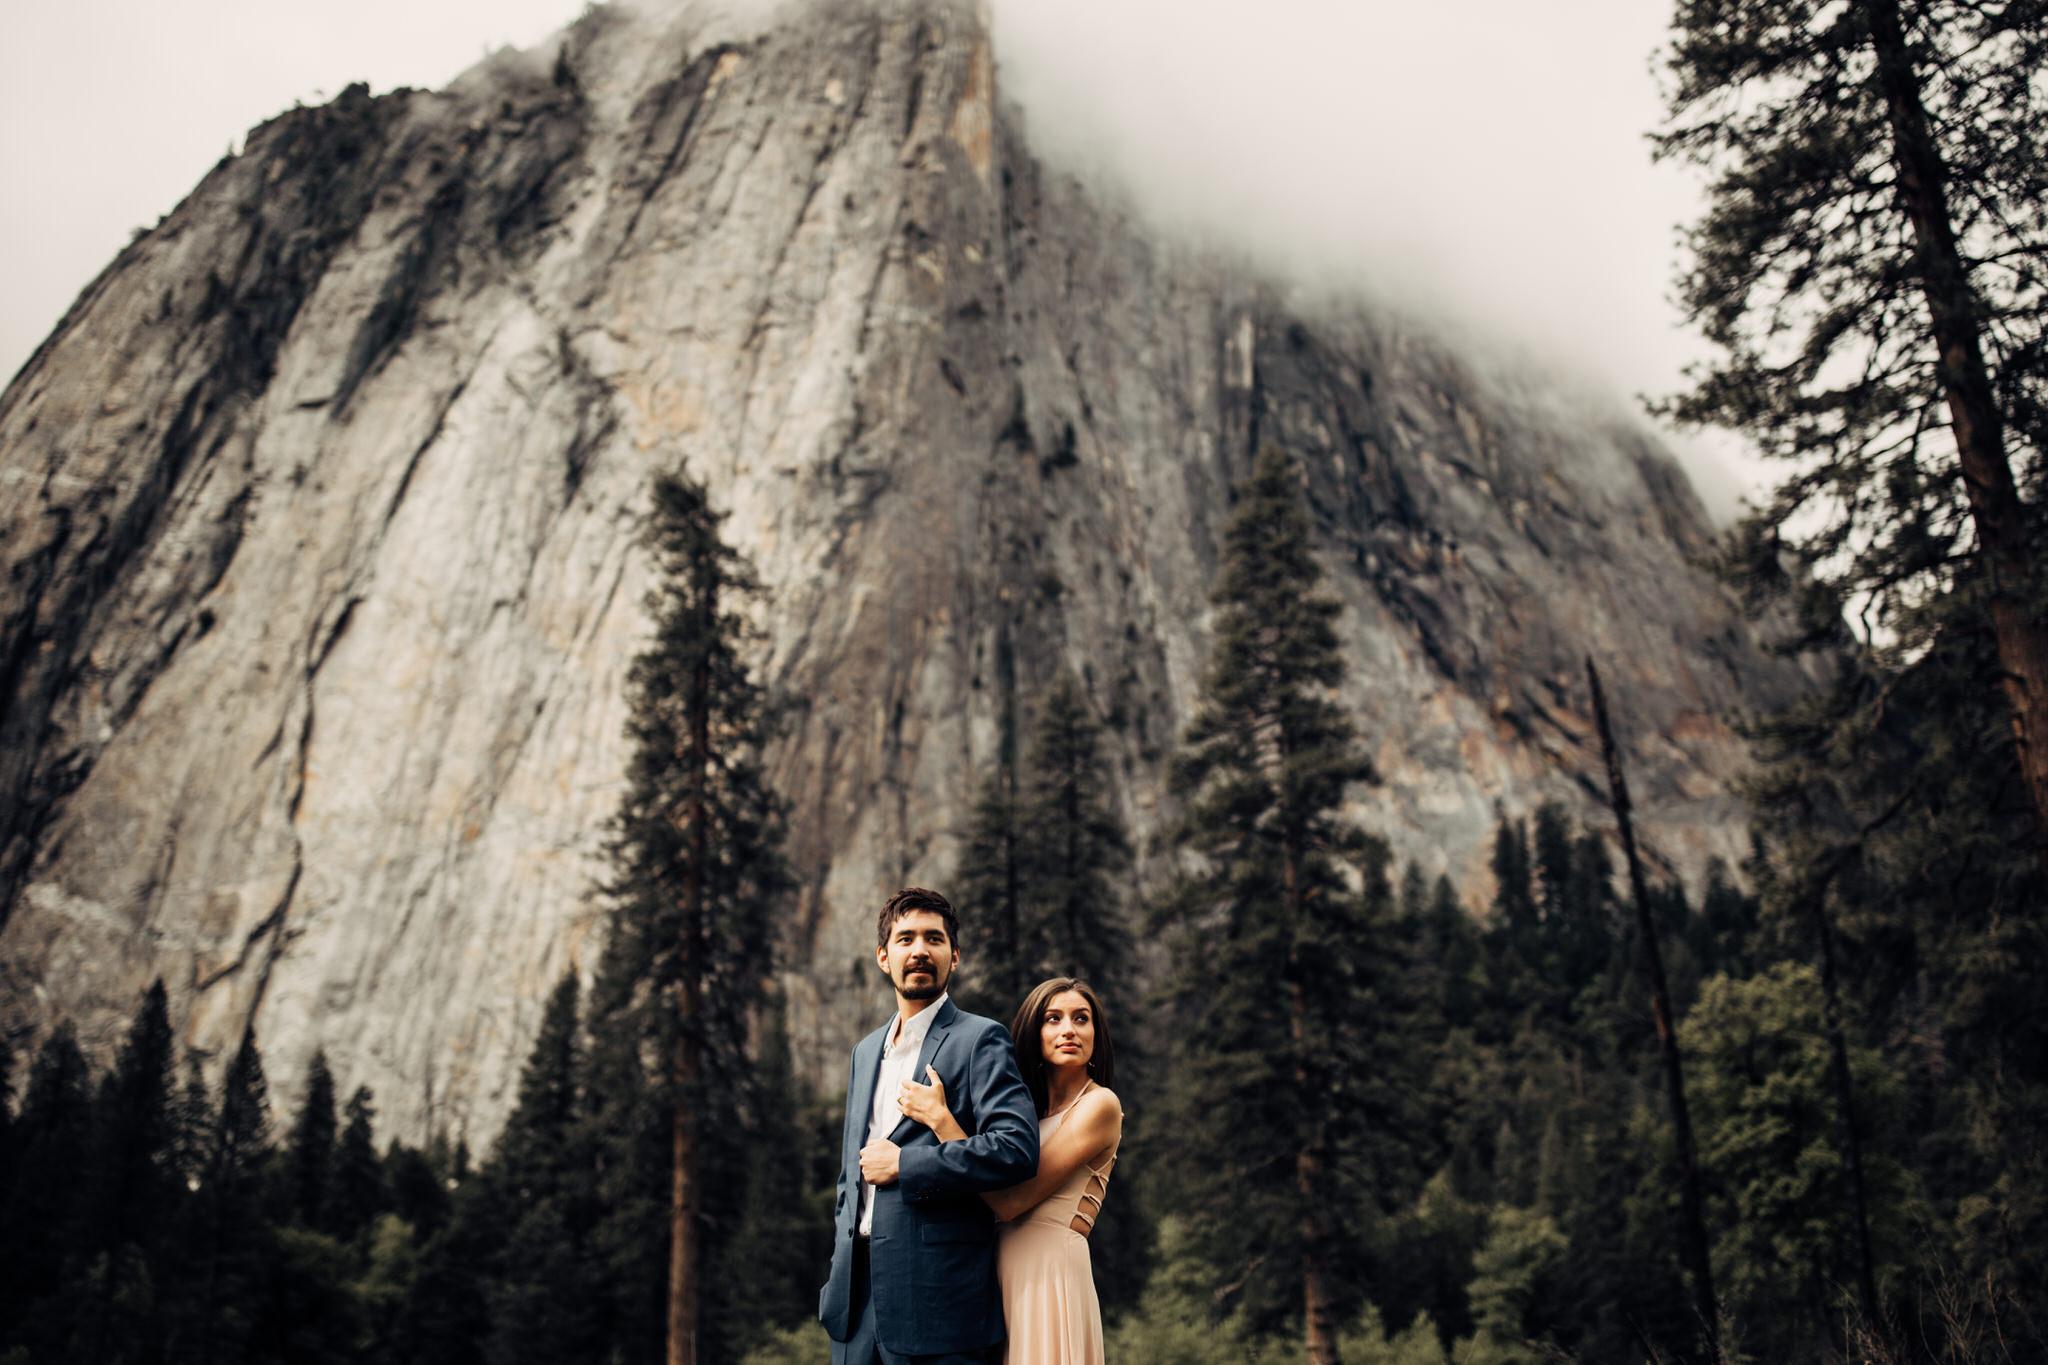 Yosemite-engagement-session-lauren-and-tom74.jpg